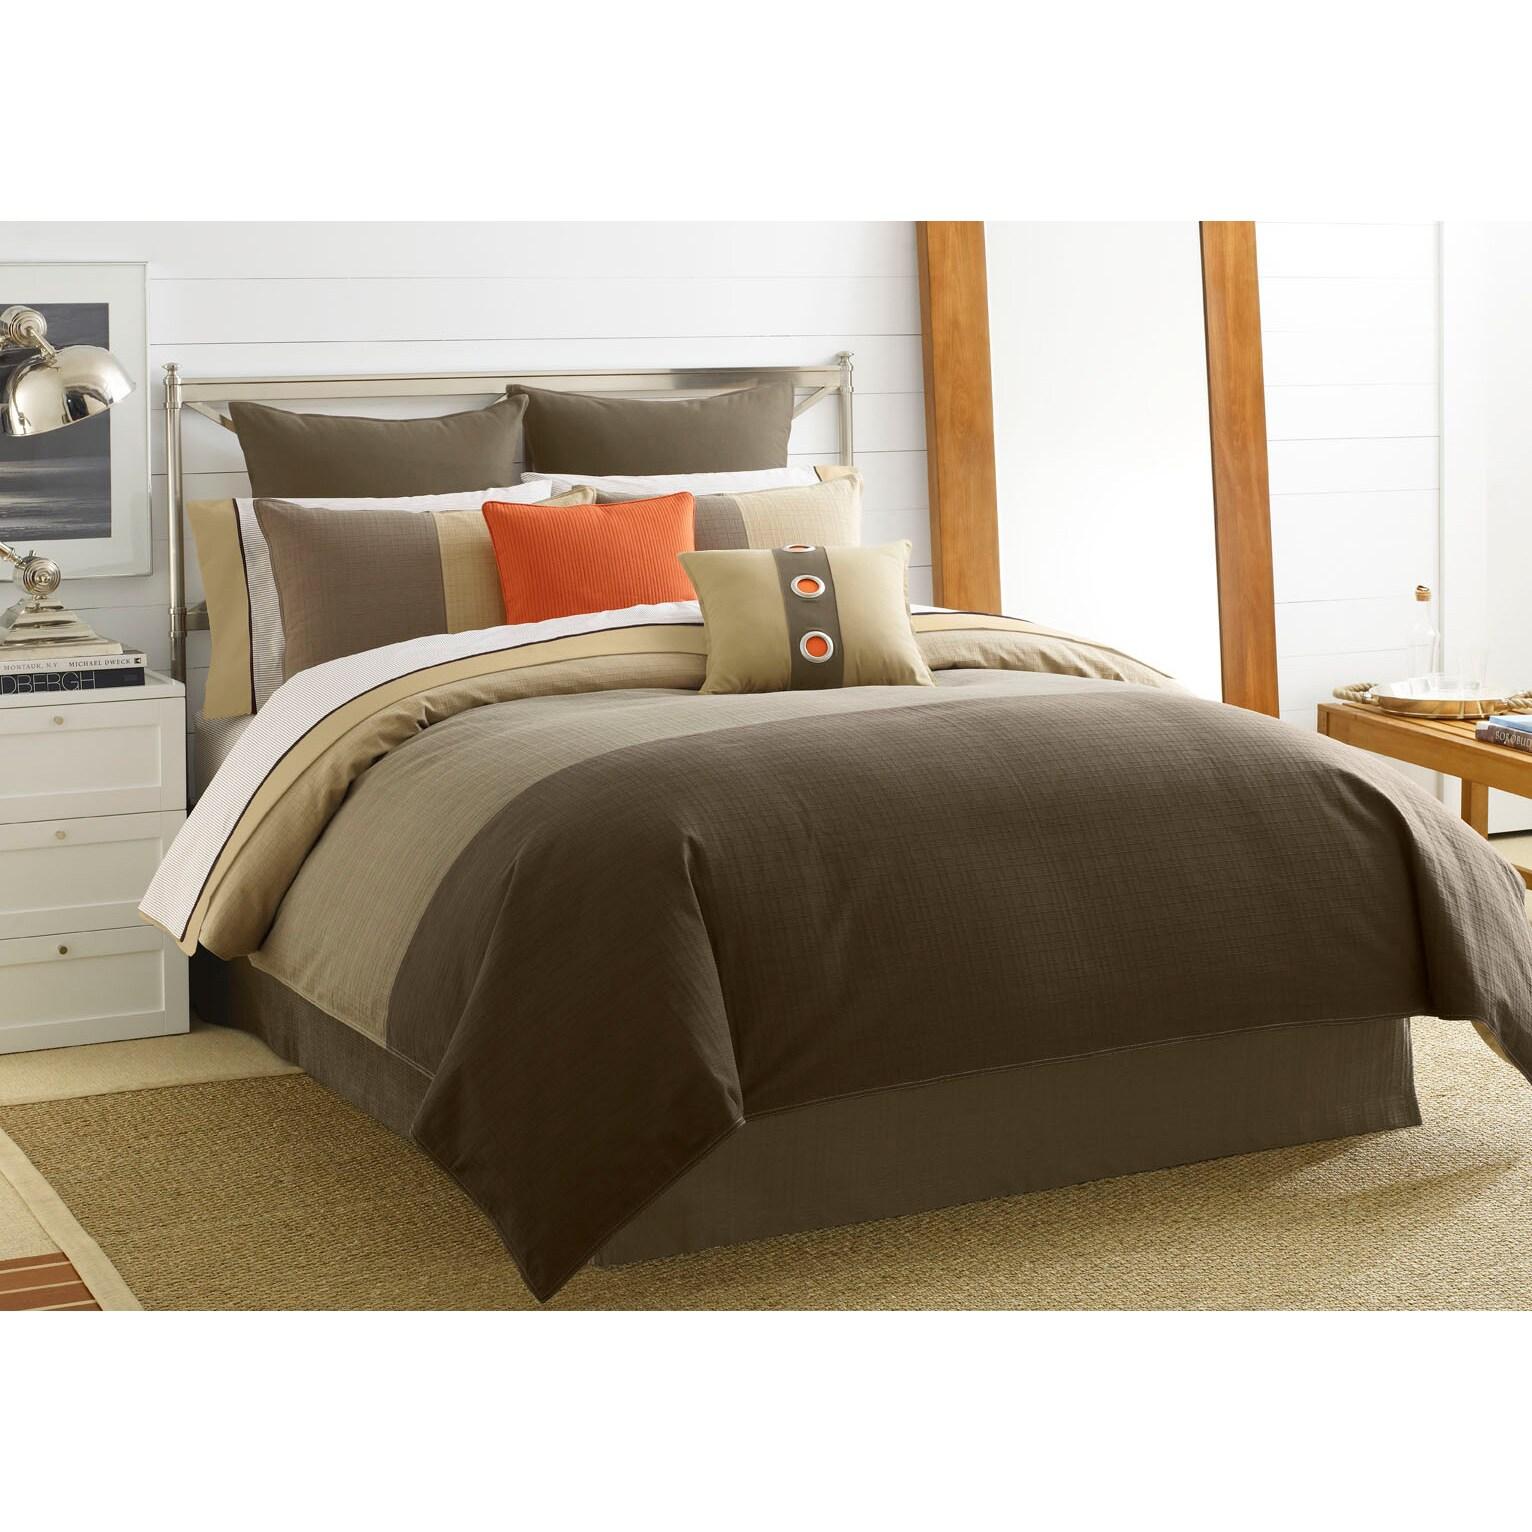 Nautica Georgetown 4-Piece Full Comforter Set